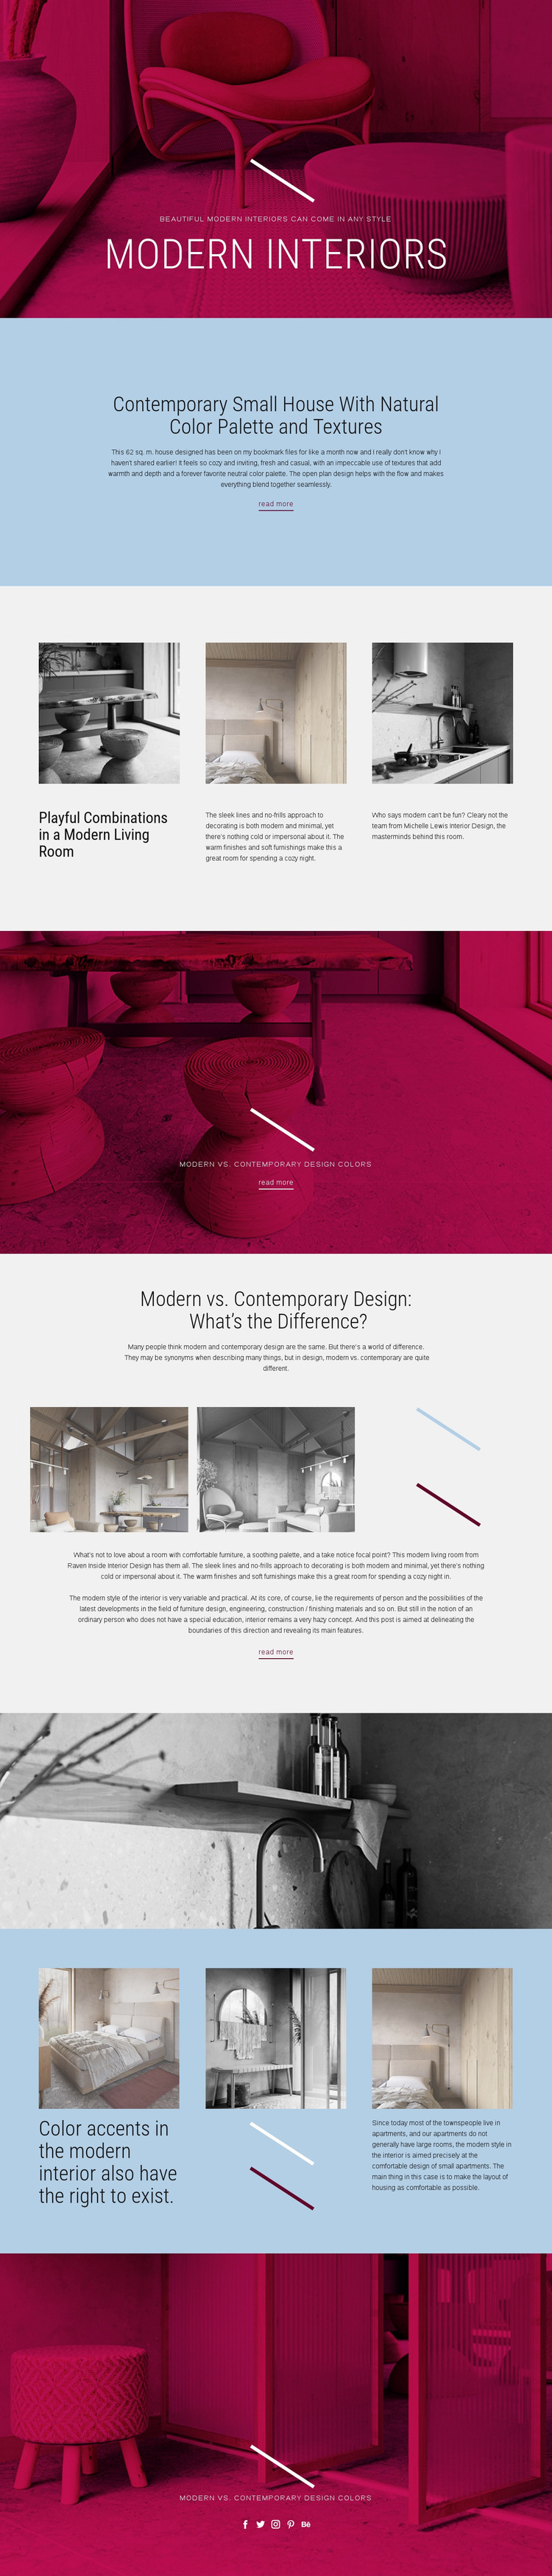 Art Nouveau furniture Website Builder Templates